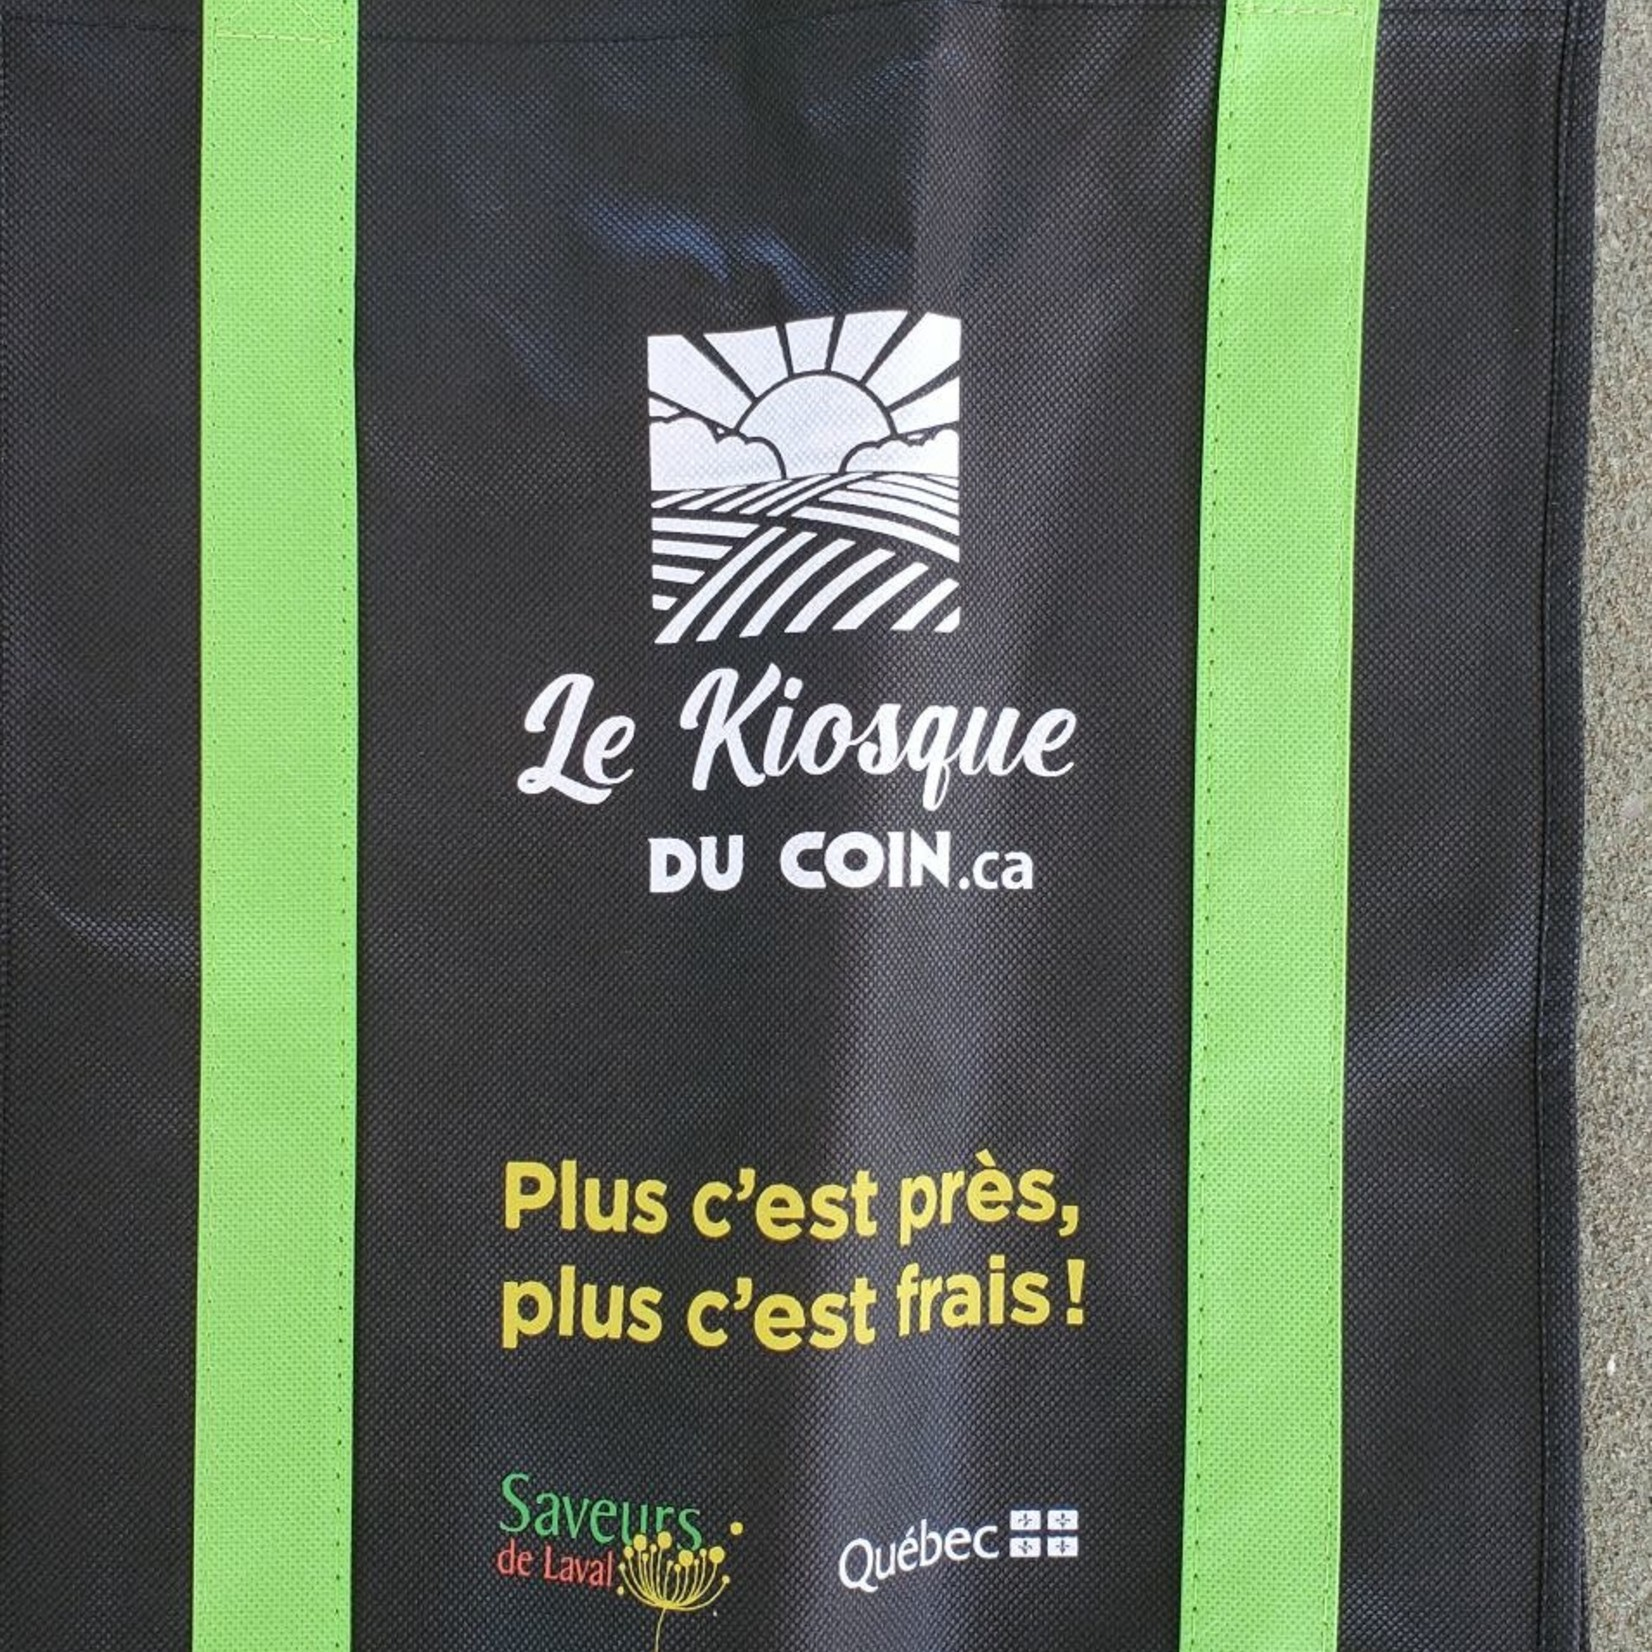 Sac réutilisable Kiosque Du Coin